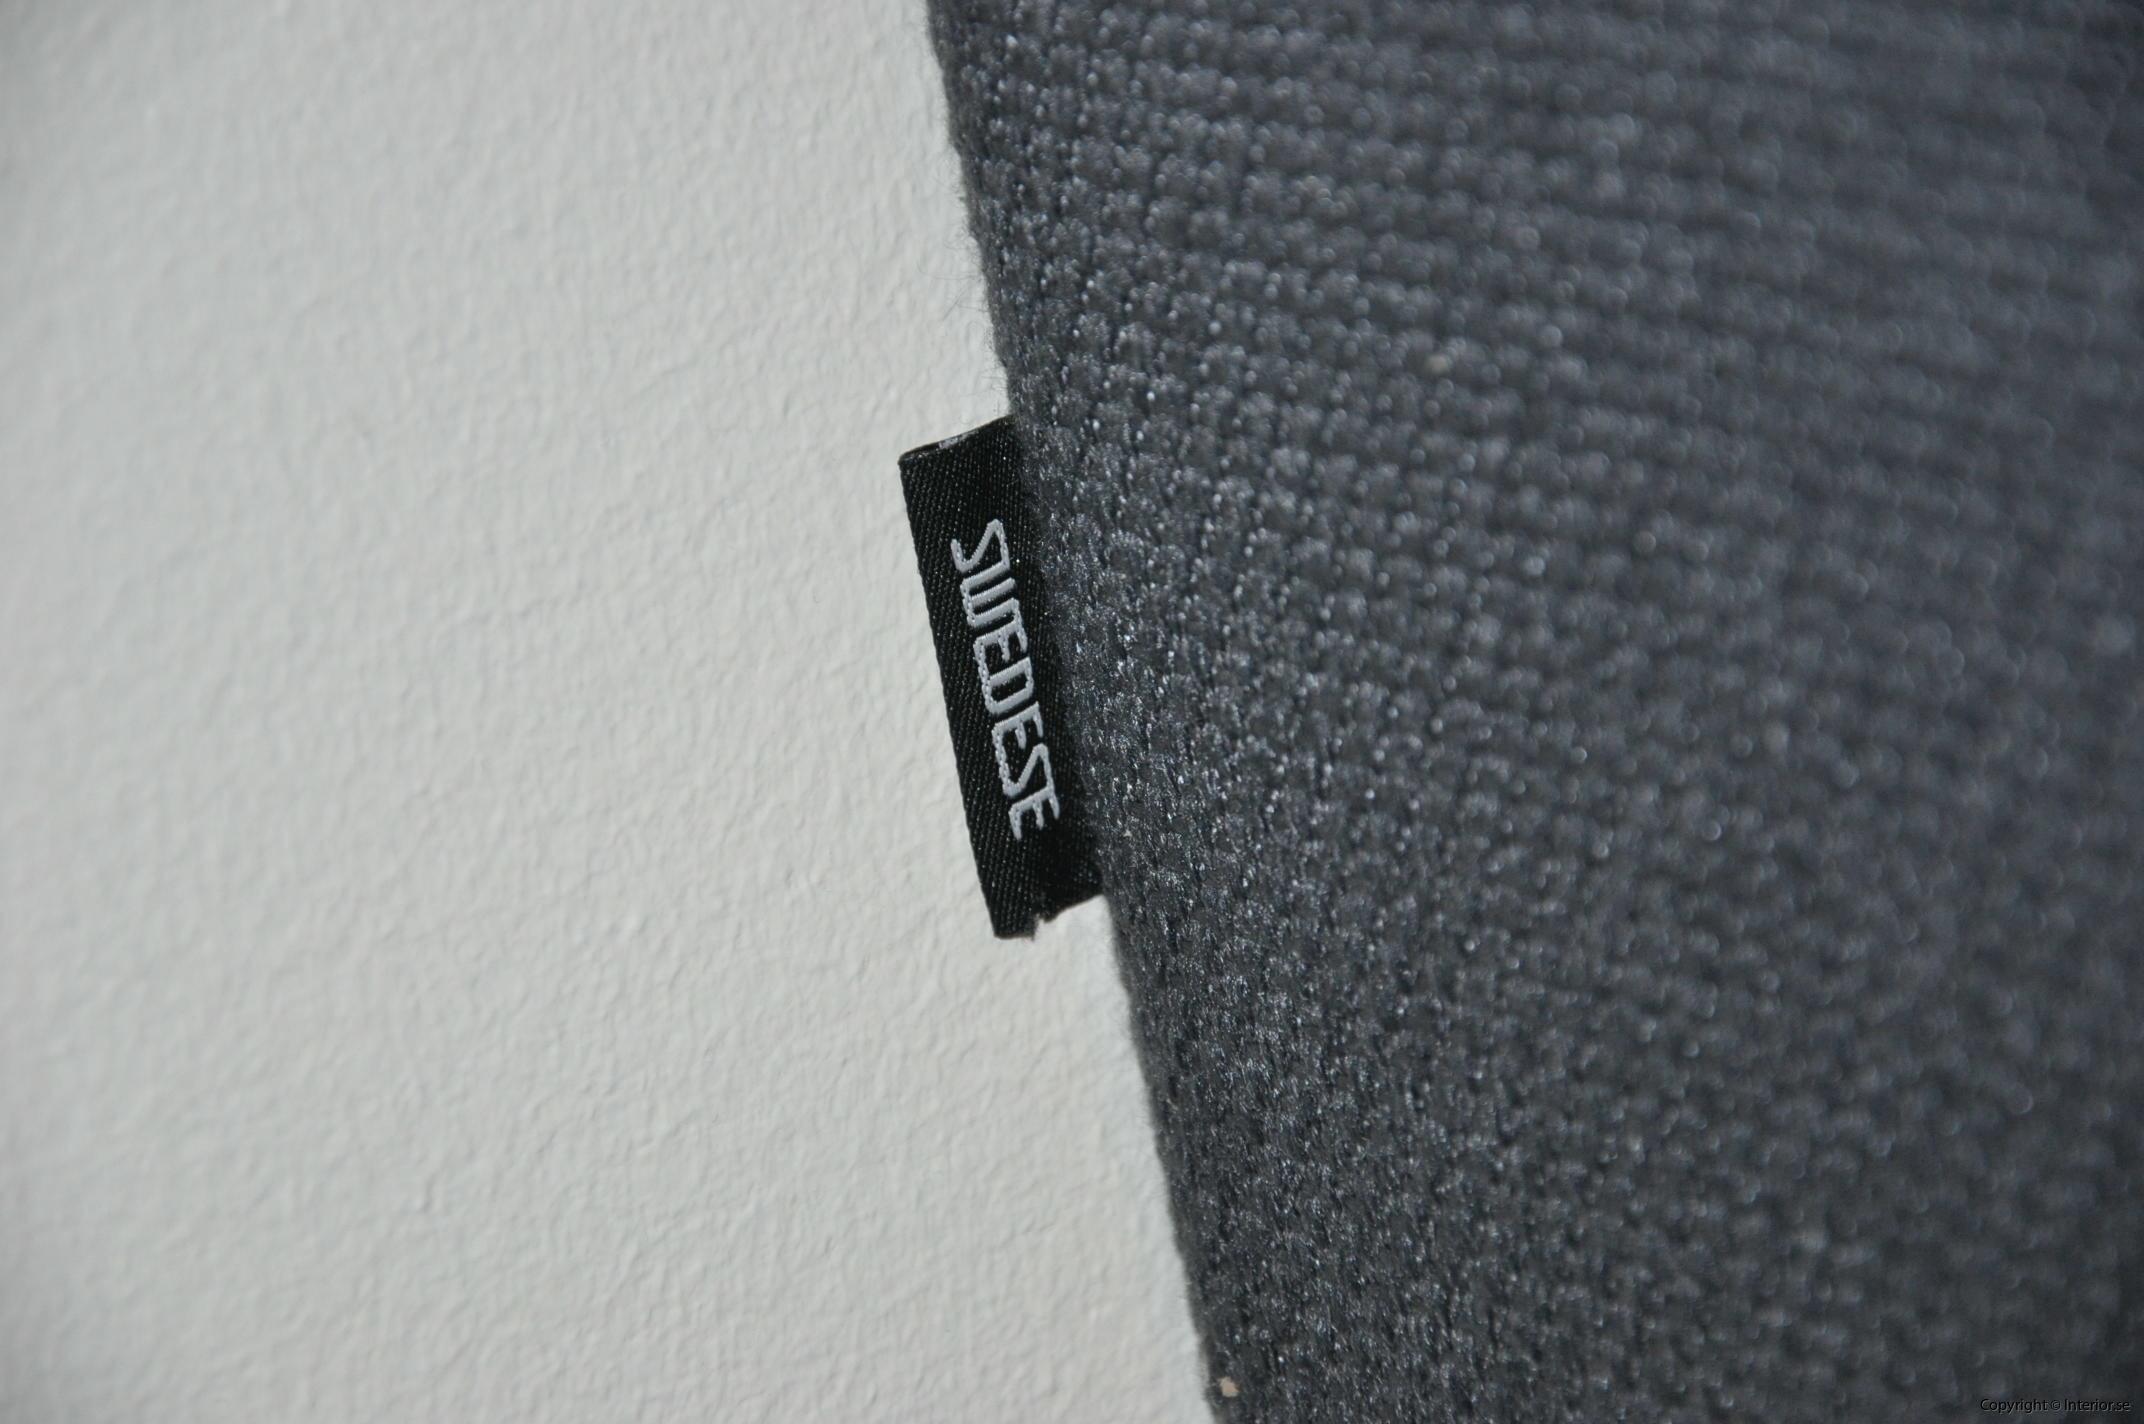 Begagnade designmöbler Swedese Madisson 3 sitssoffa (8)